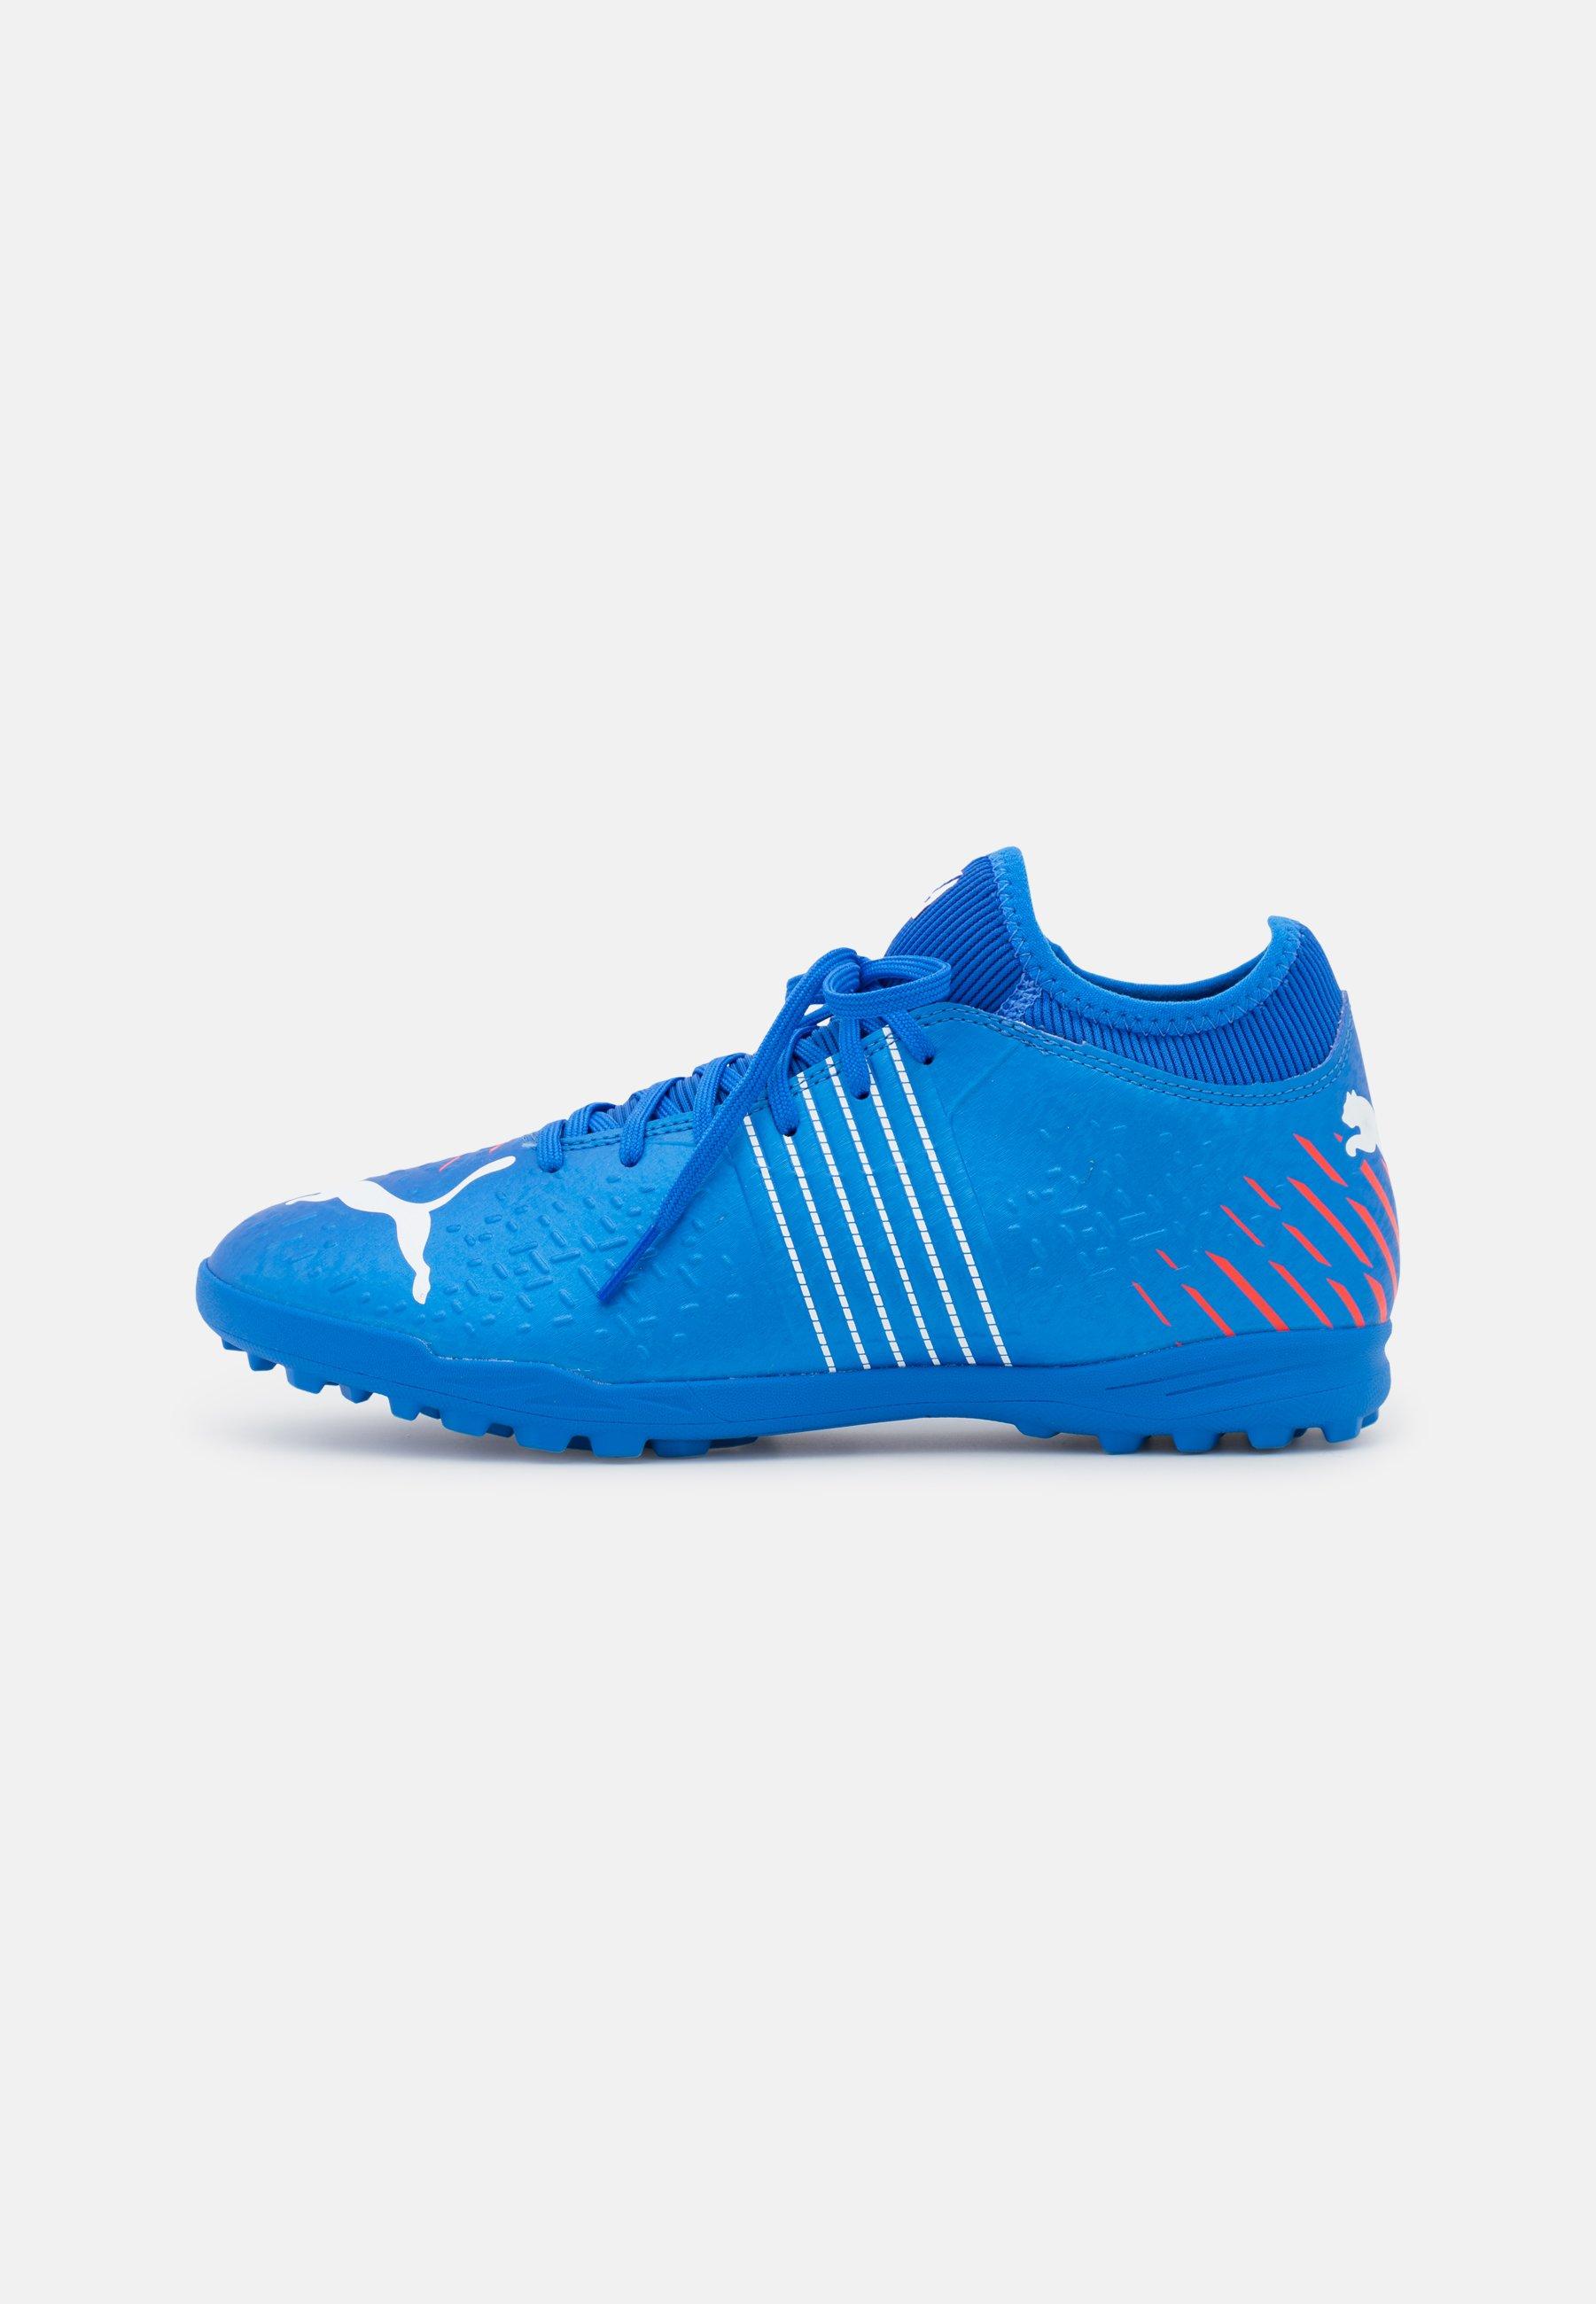 Homme FUTURE Z 4.2 TT - Chaussures de foot multicrampons